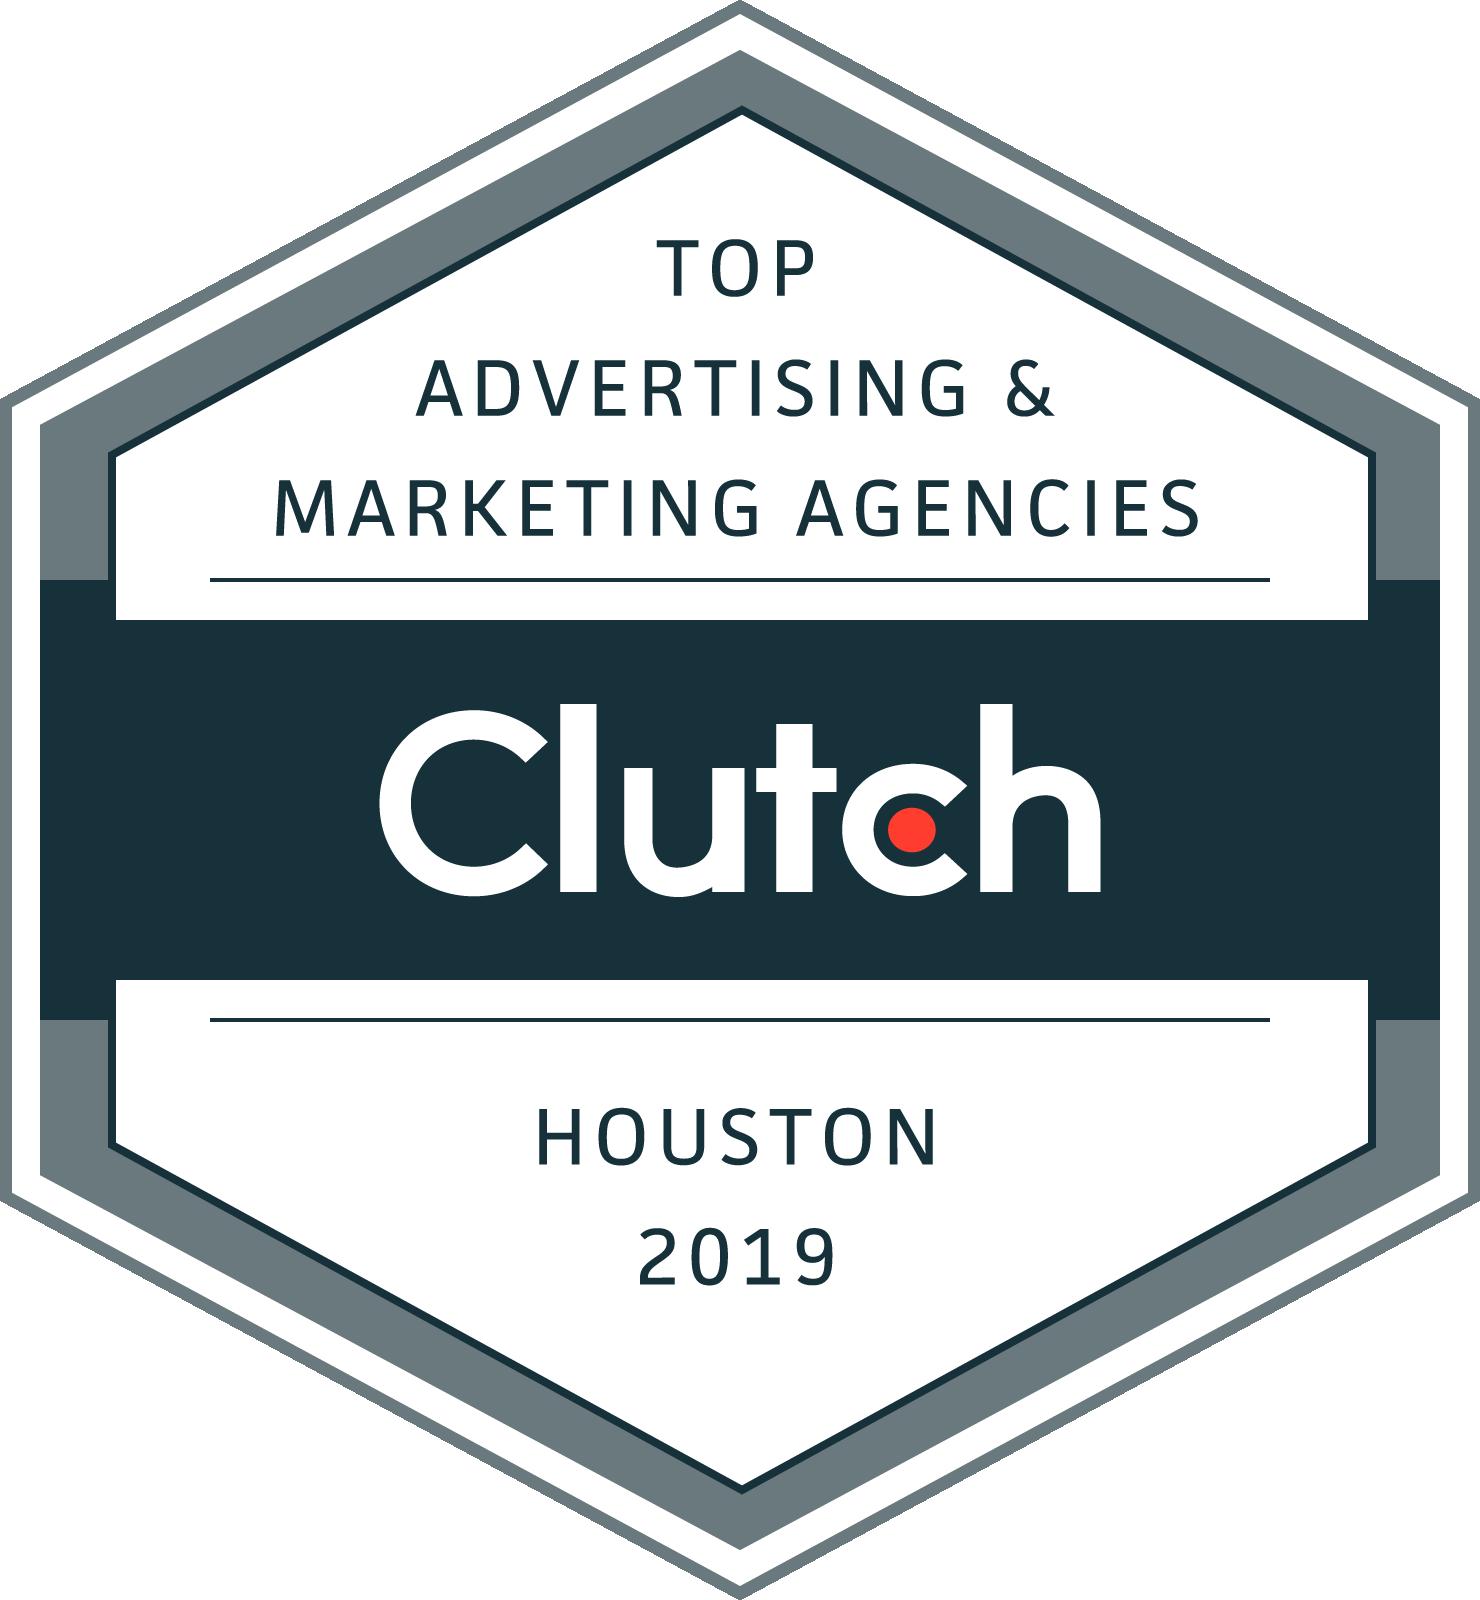 LyntonWeb Recognized as Clutch Leader for Best Digital Marketing Agency